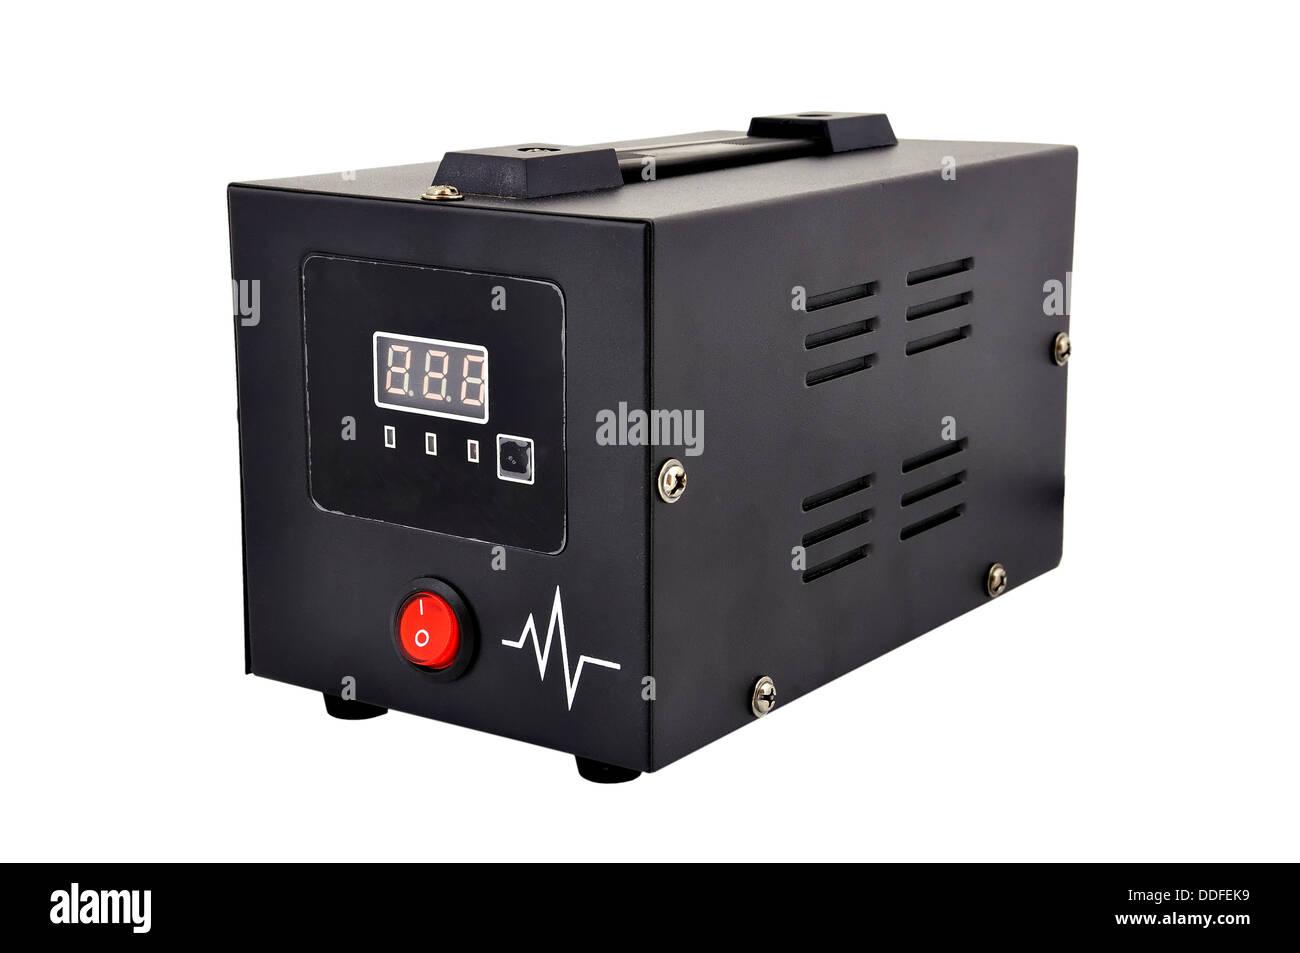 voltage regulator - Stock Image